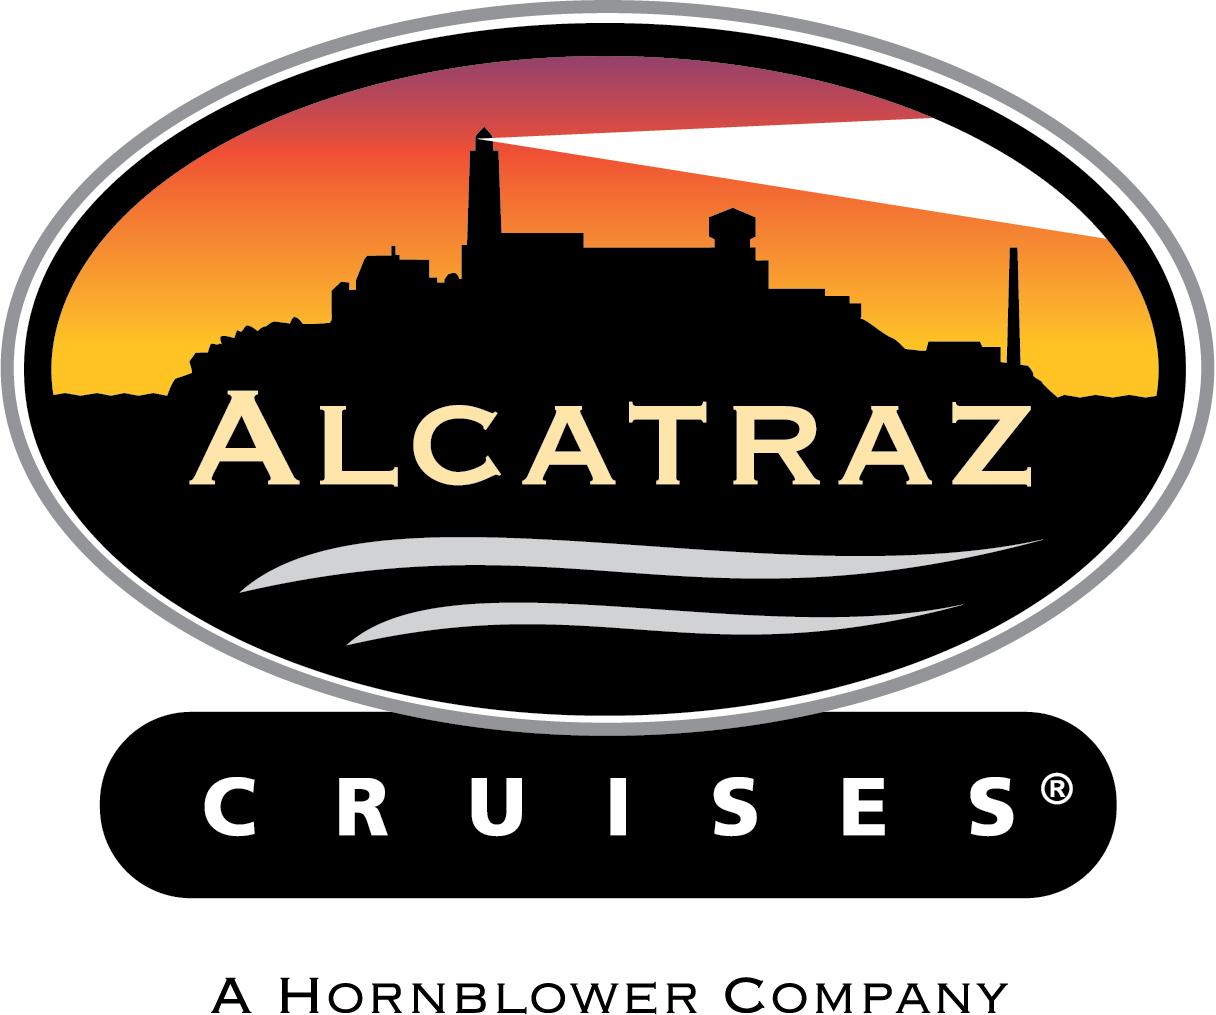 Alcatraz_Cruises_VIDEO.jpg